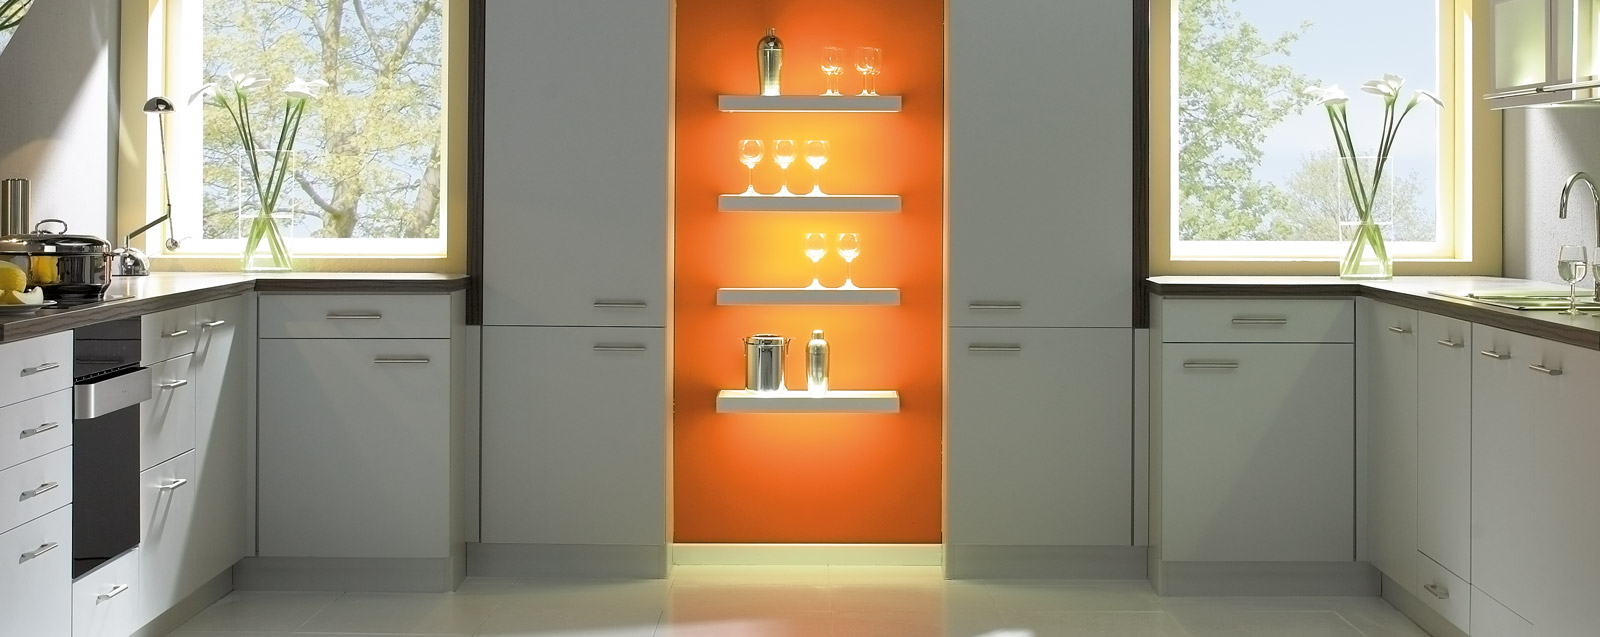 m beldirektverkauf. Black Bedroom Furniture Sets. Home Design Ideas